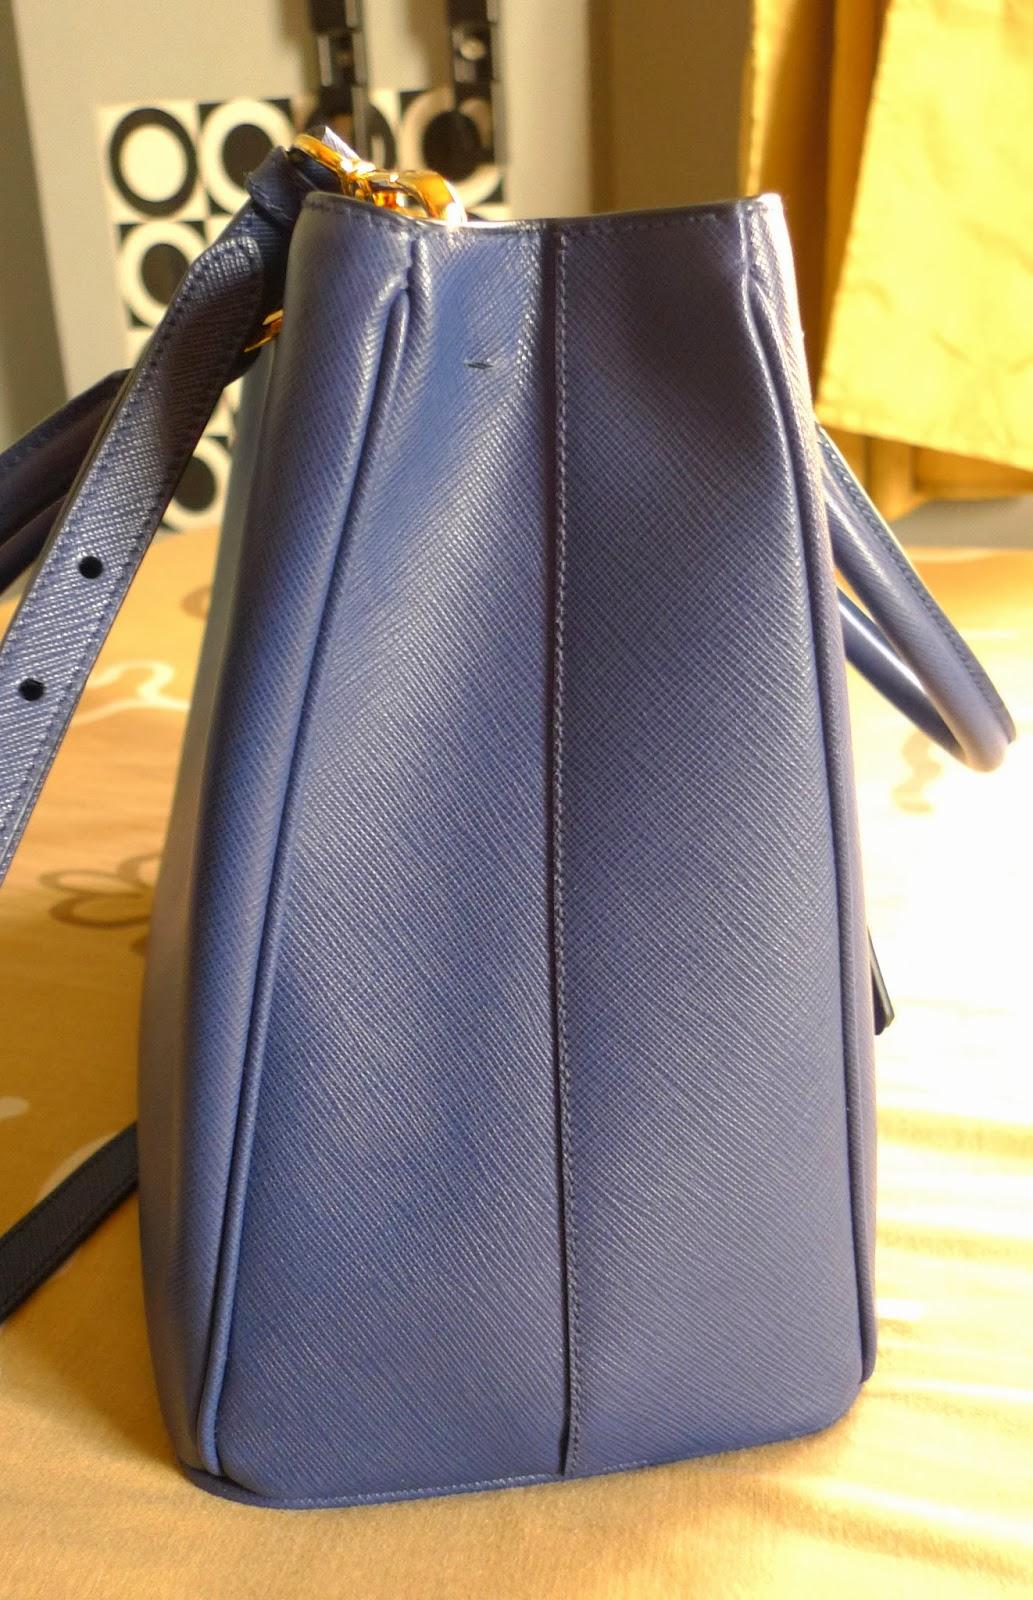 c559b603eec7 Prada Lux Saffiano BN1874 Review + Authenticate your Prada Lux Saffiano  BN1874!